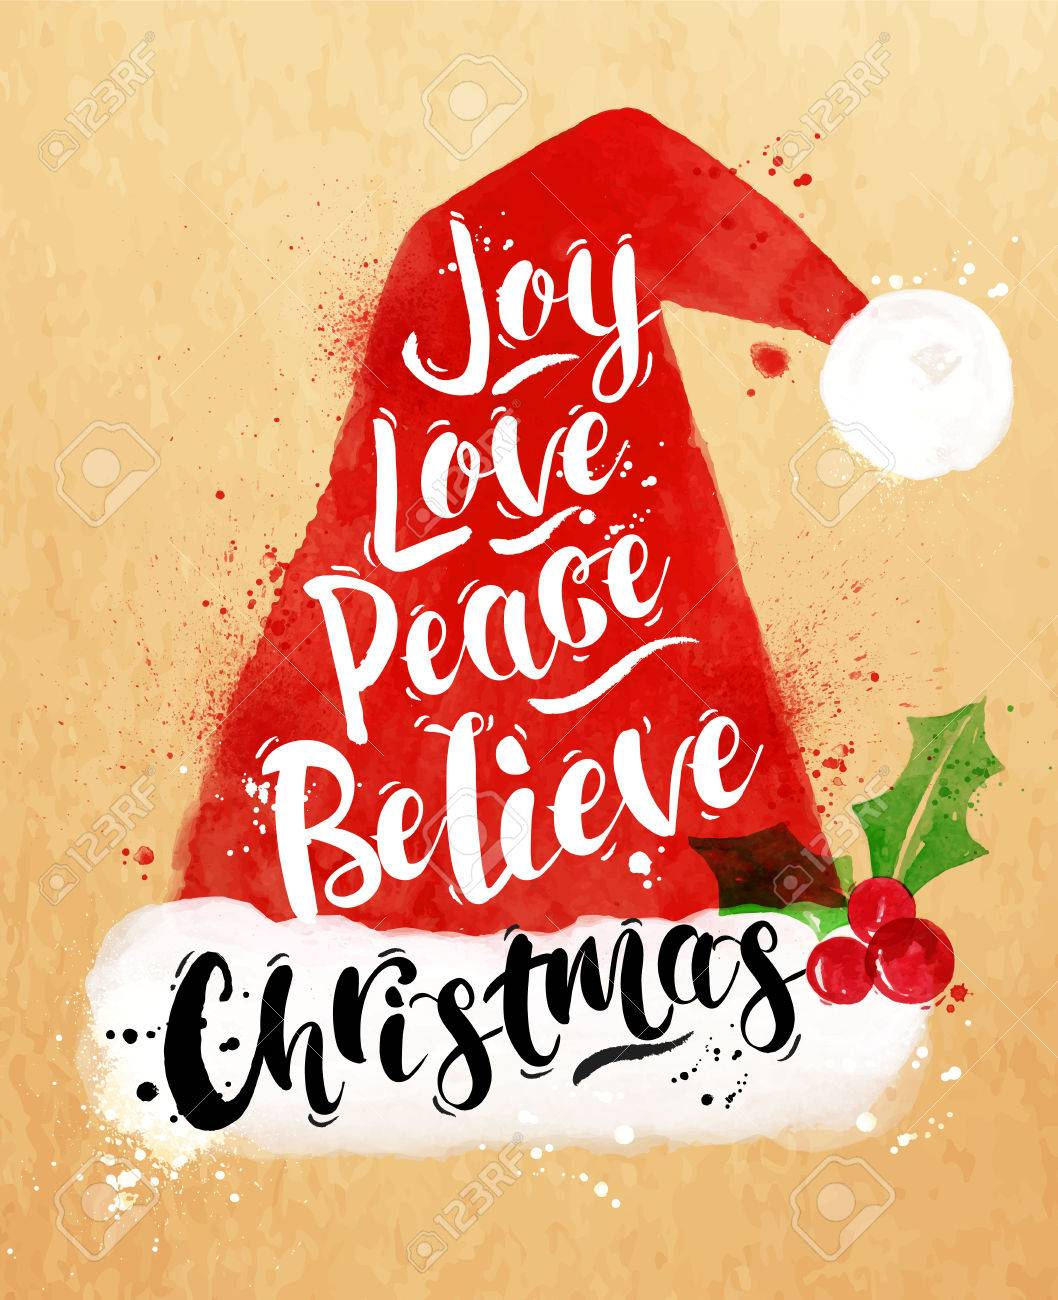 d68de55943960 Vector - Watercolor poster Christmas Santa hat lettering joy